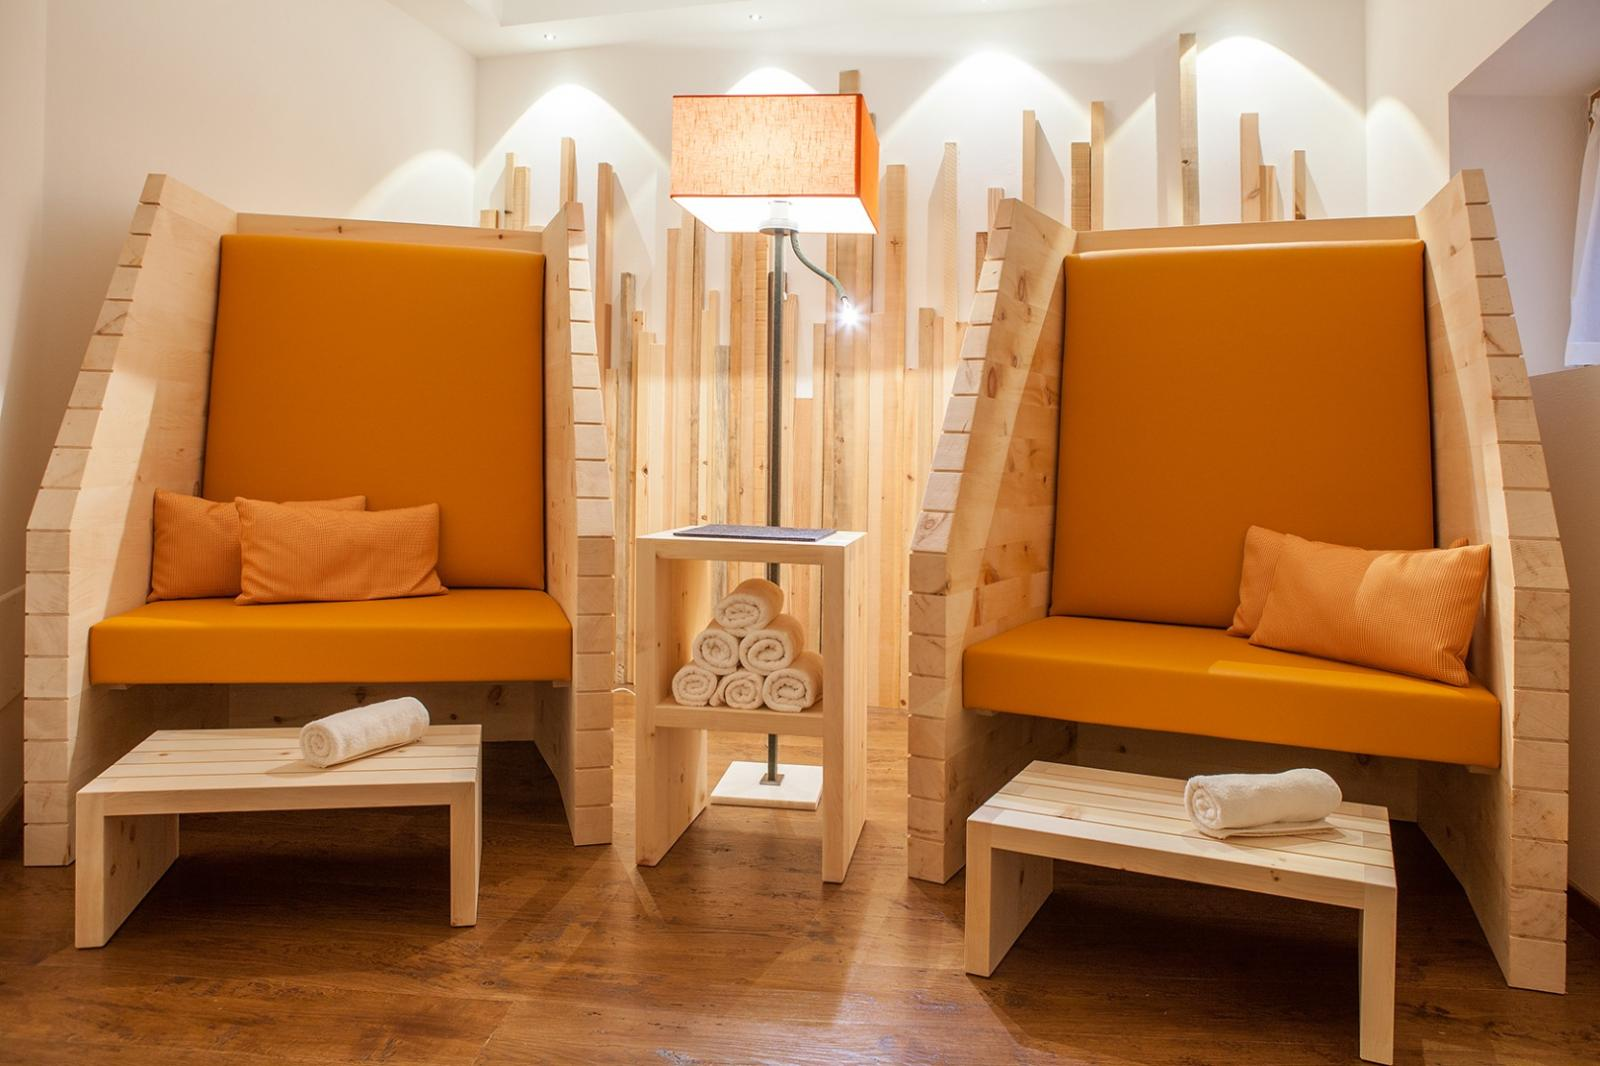 Fünf Elemente: Foto vom Wellnesshotel Hotel Weihrerhof - The lakeside of life.   Wellness Südtirol